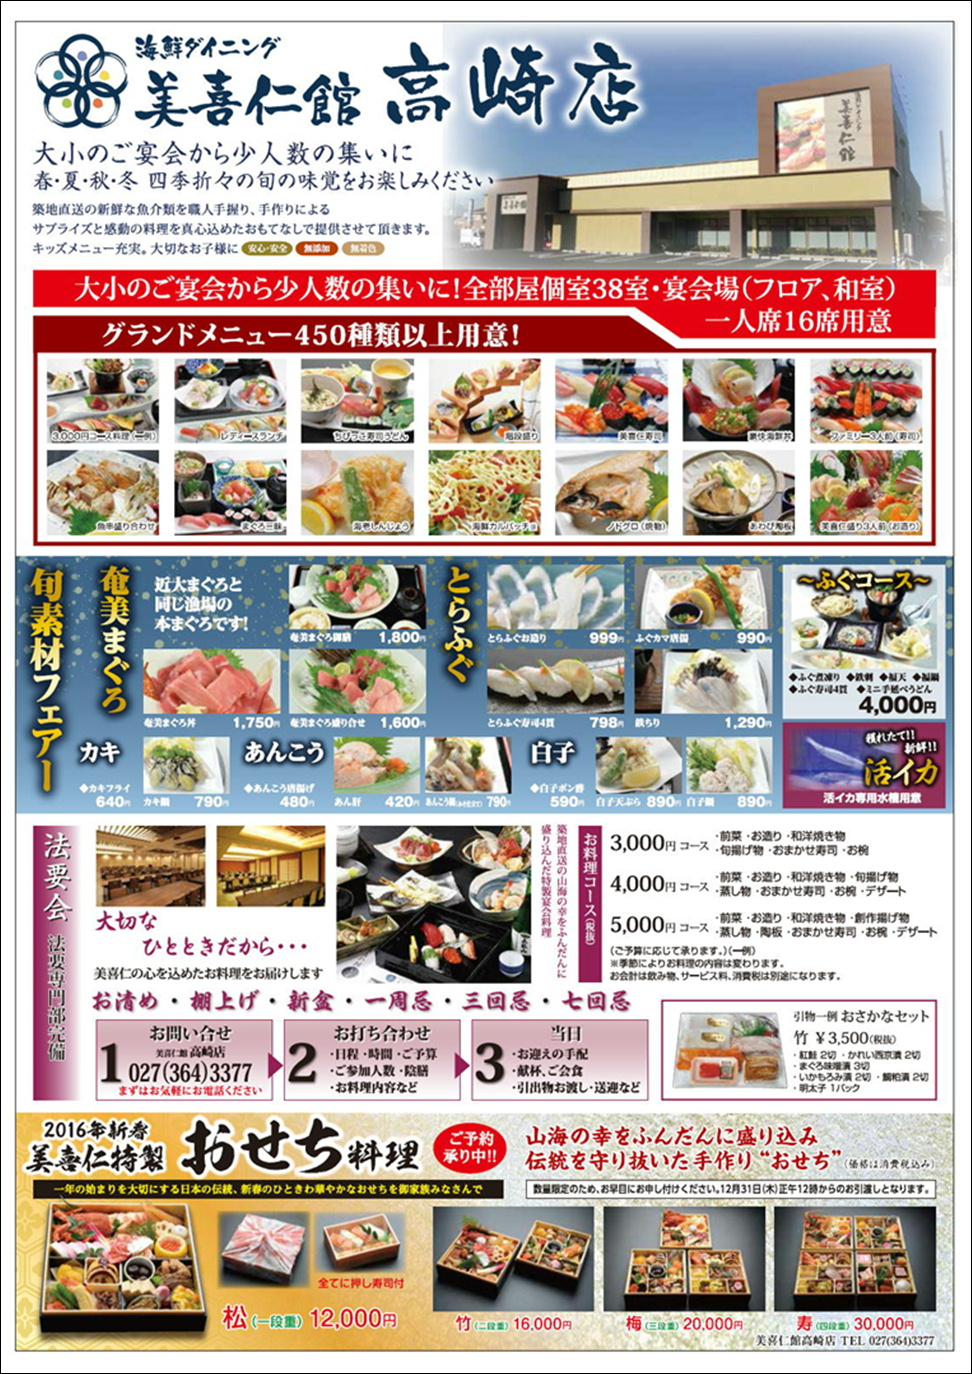 美喜仁館 高崎店 *法要会・忘年会・新年会・各種ご宴会 承ります。